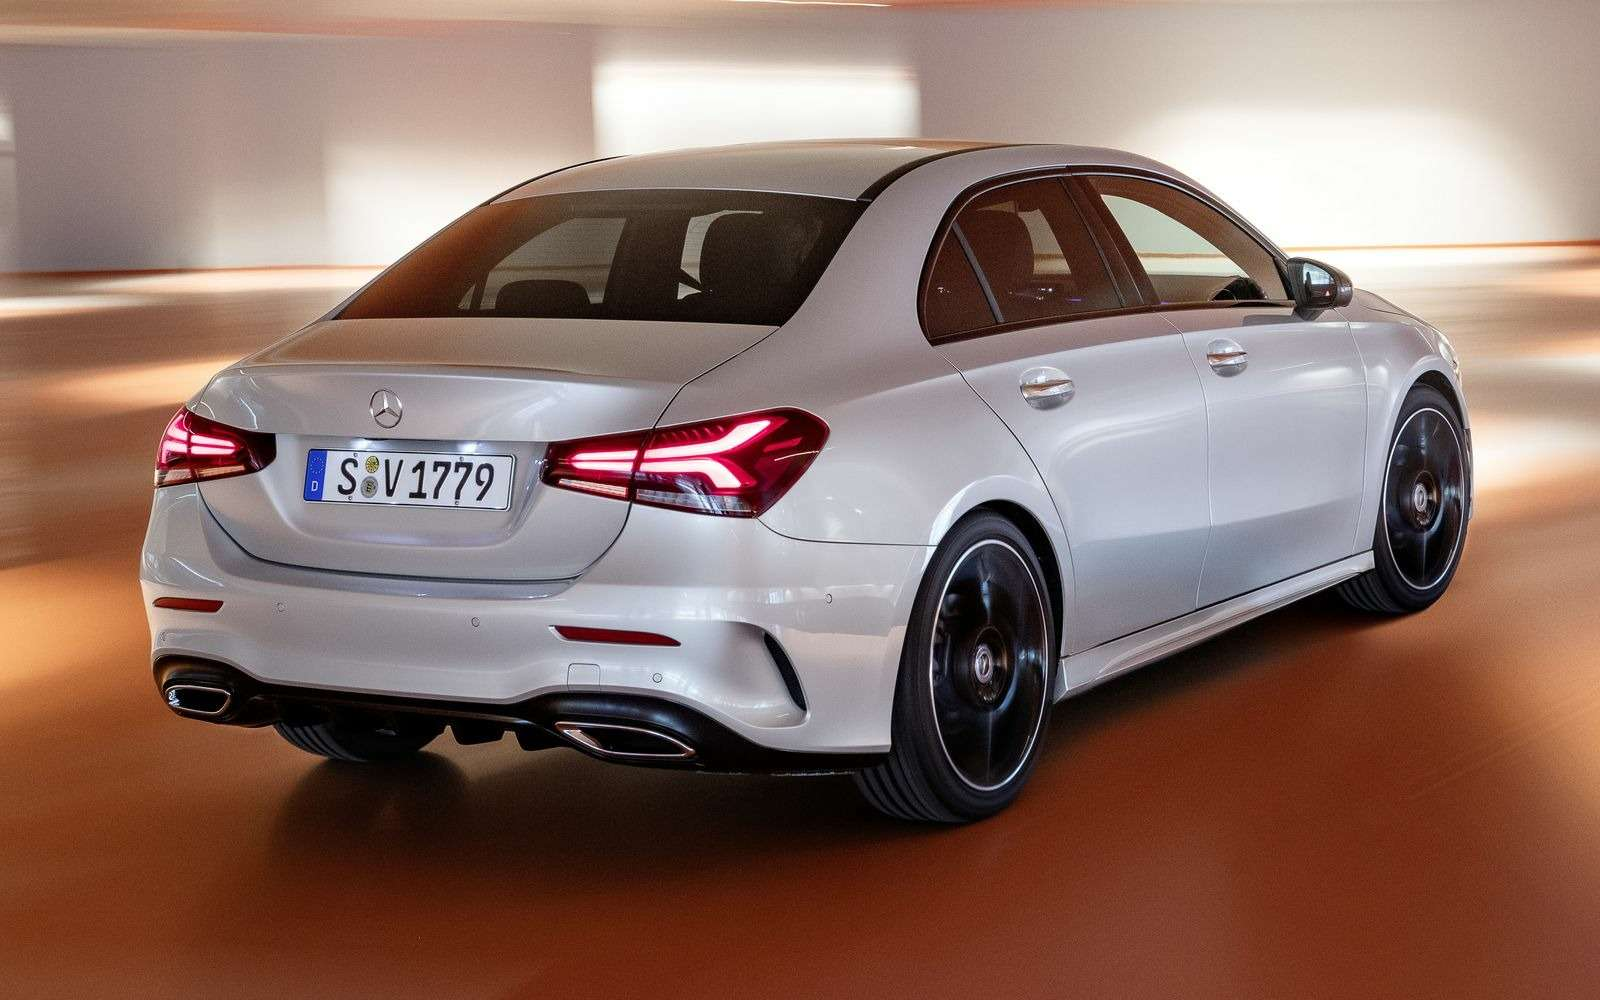 Евростандарт: представлен короткий седан Mercedes-Benz A-класса— фото 890440